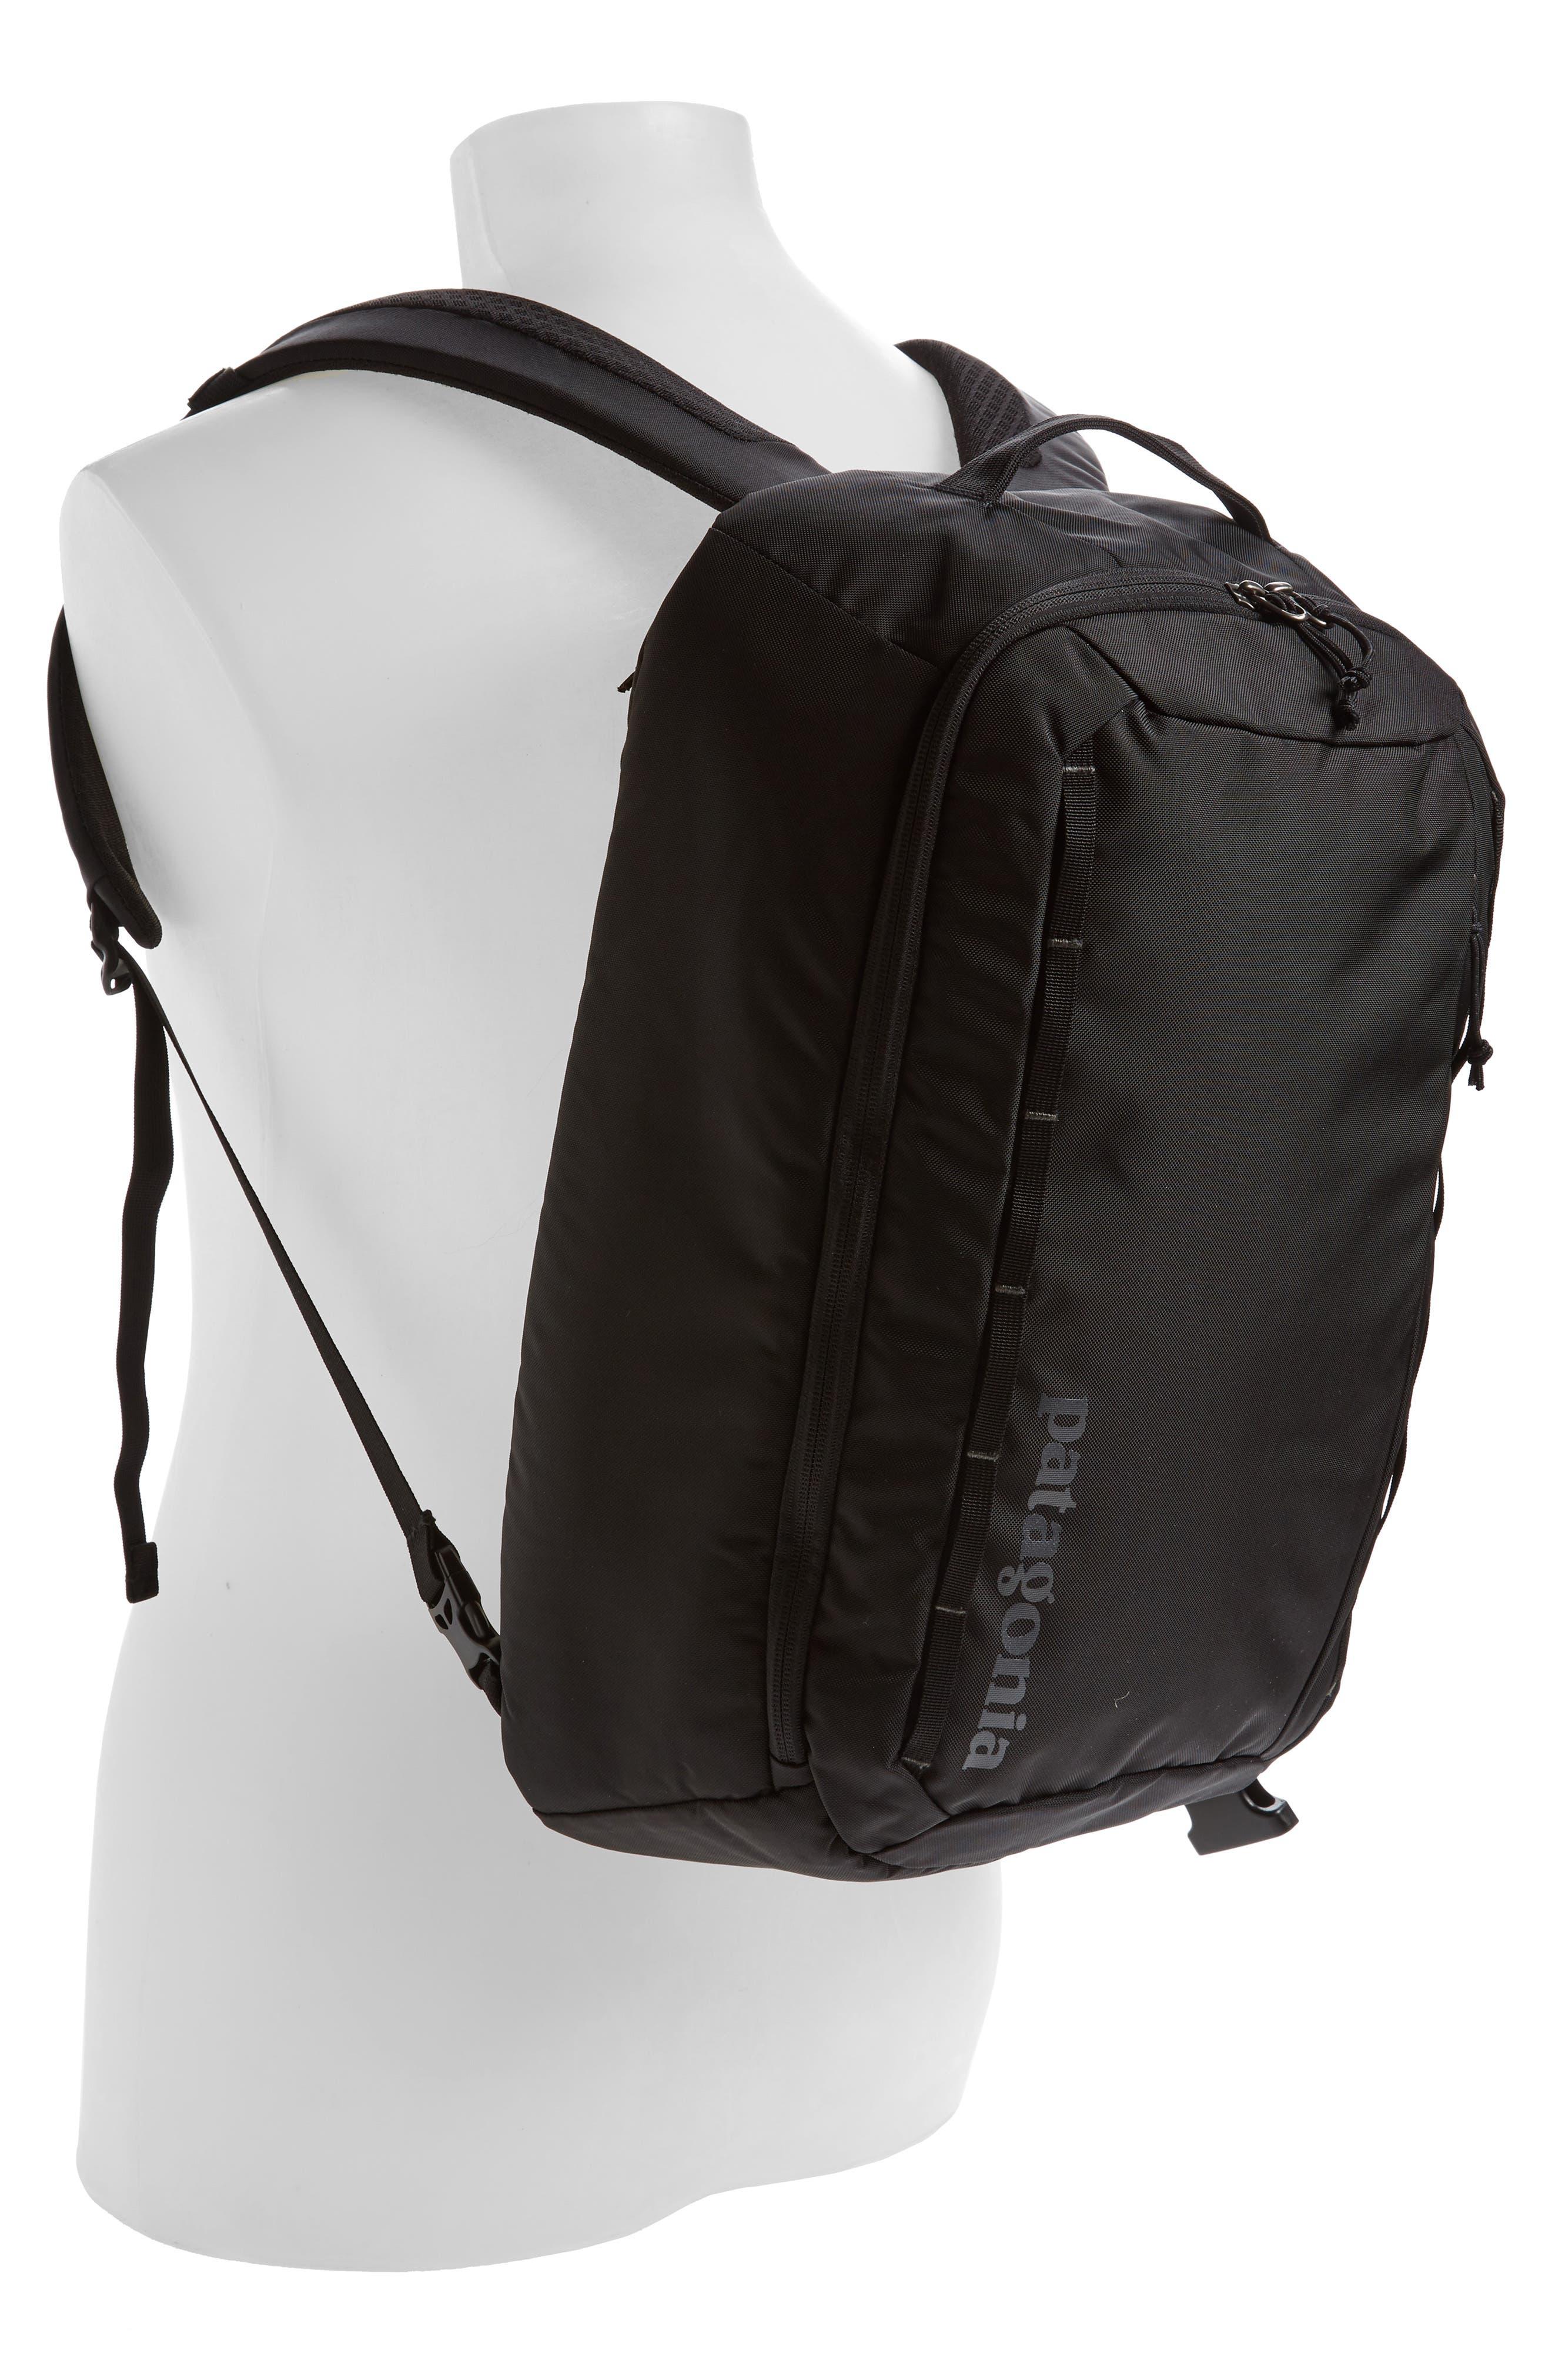 PATAGONIA, Tres 25-Liter Convertible Backpack, Alternate thumbnail 2, color, BLACK